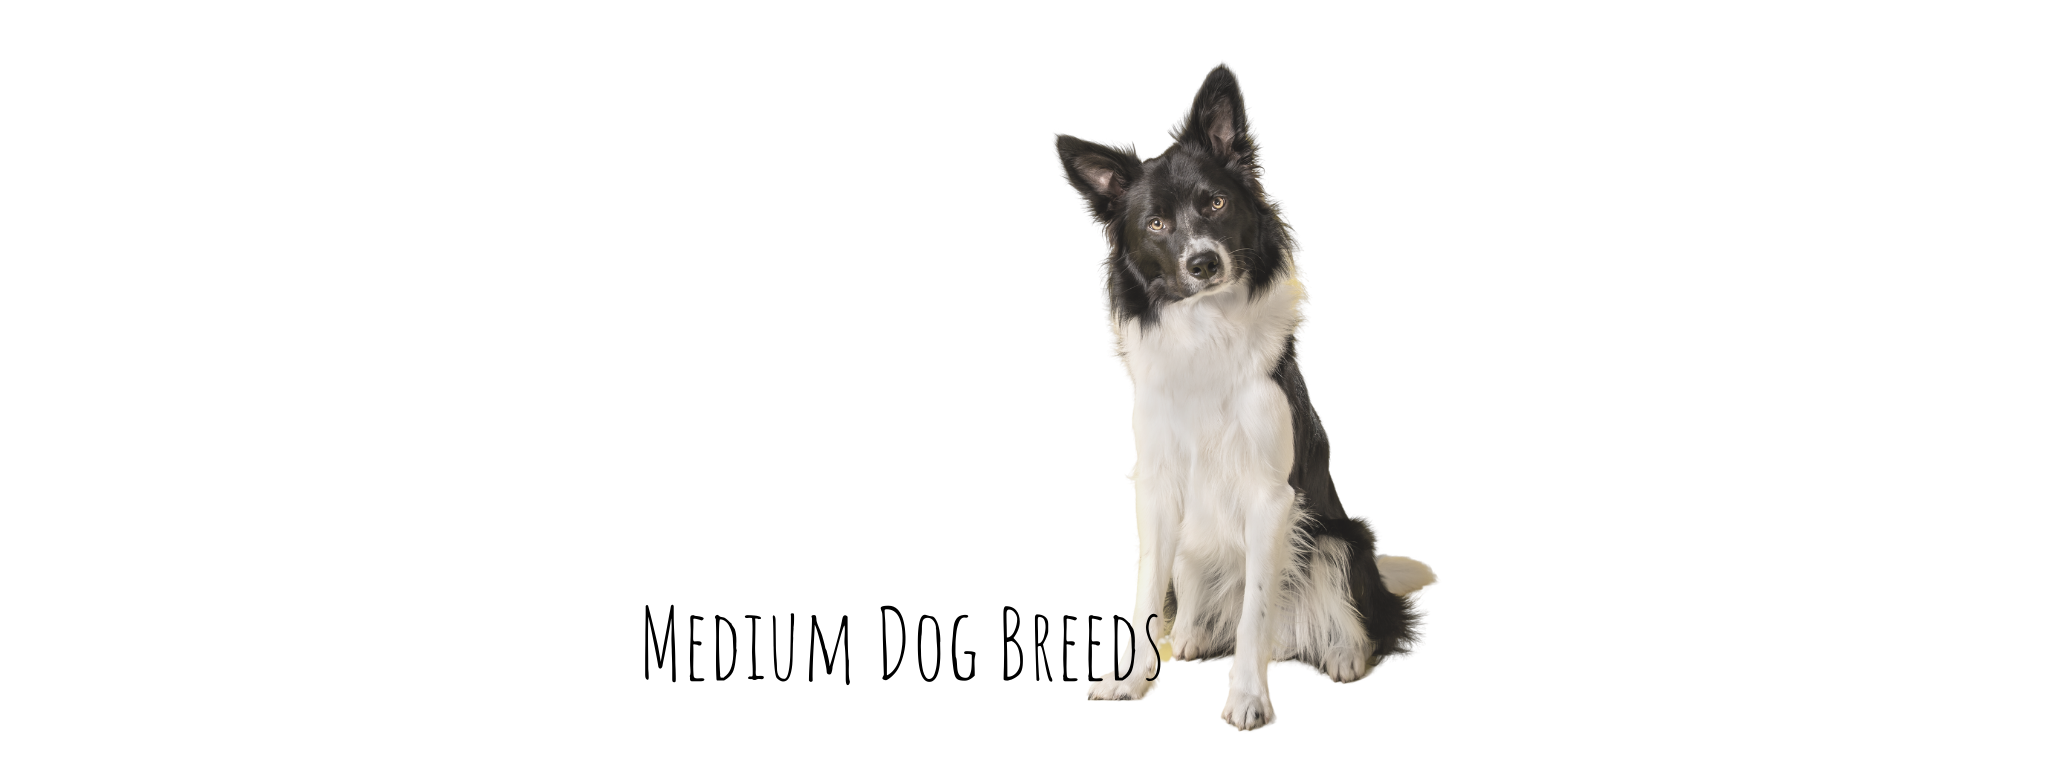 medium size dogs